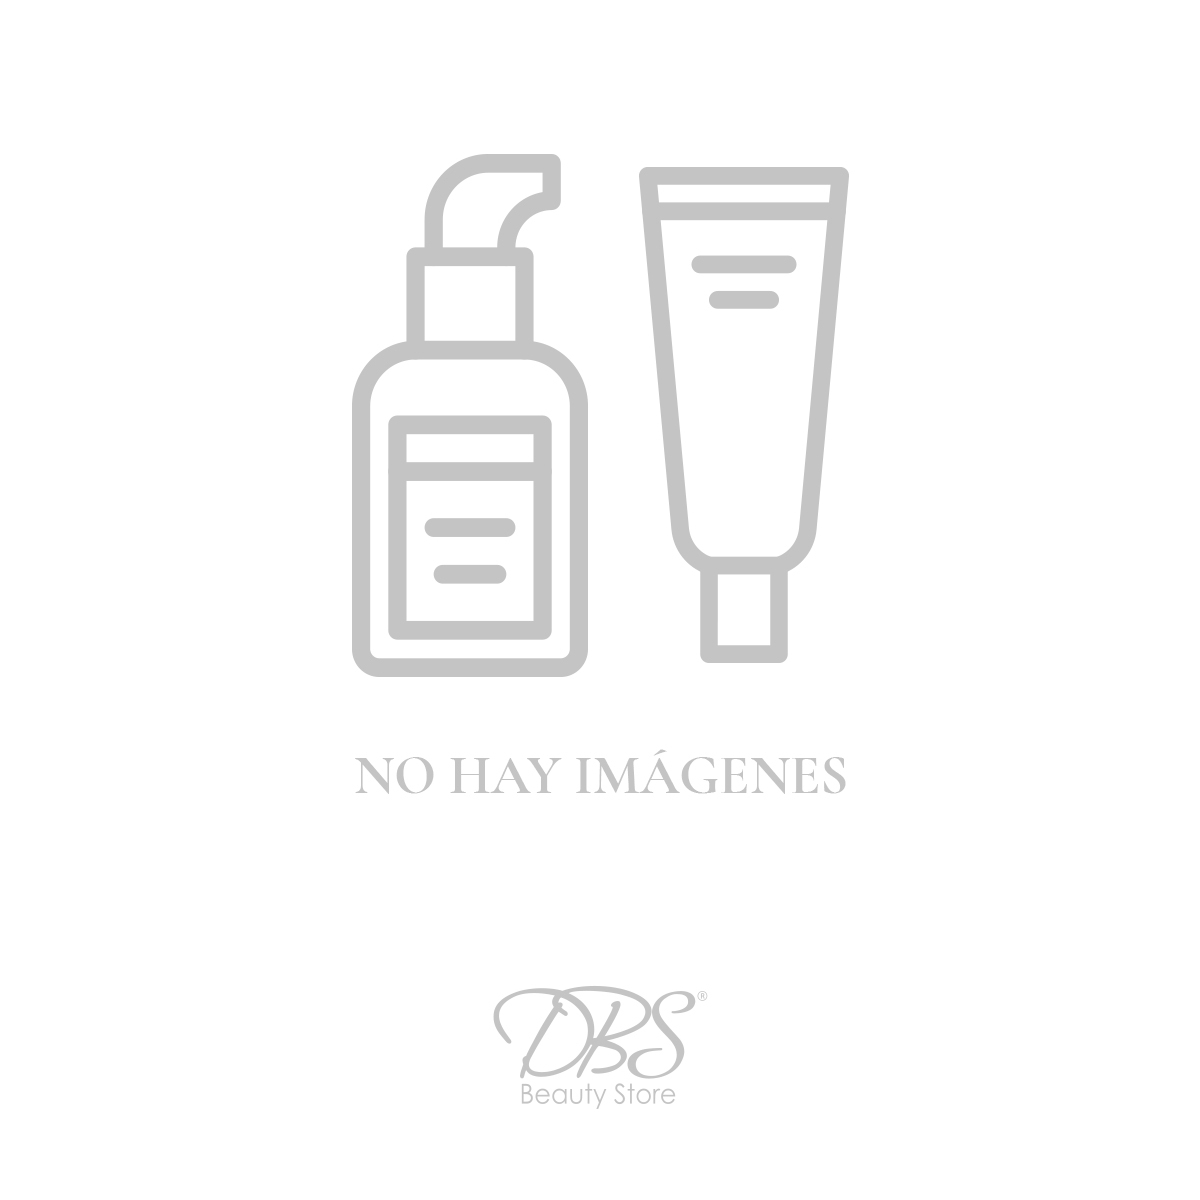 Paleta De Sombra De Ojos Pro Next-Gen Nudes Slim 010